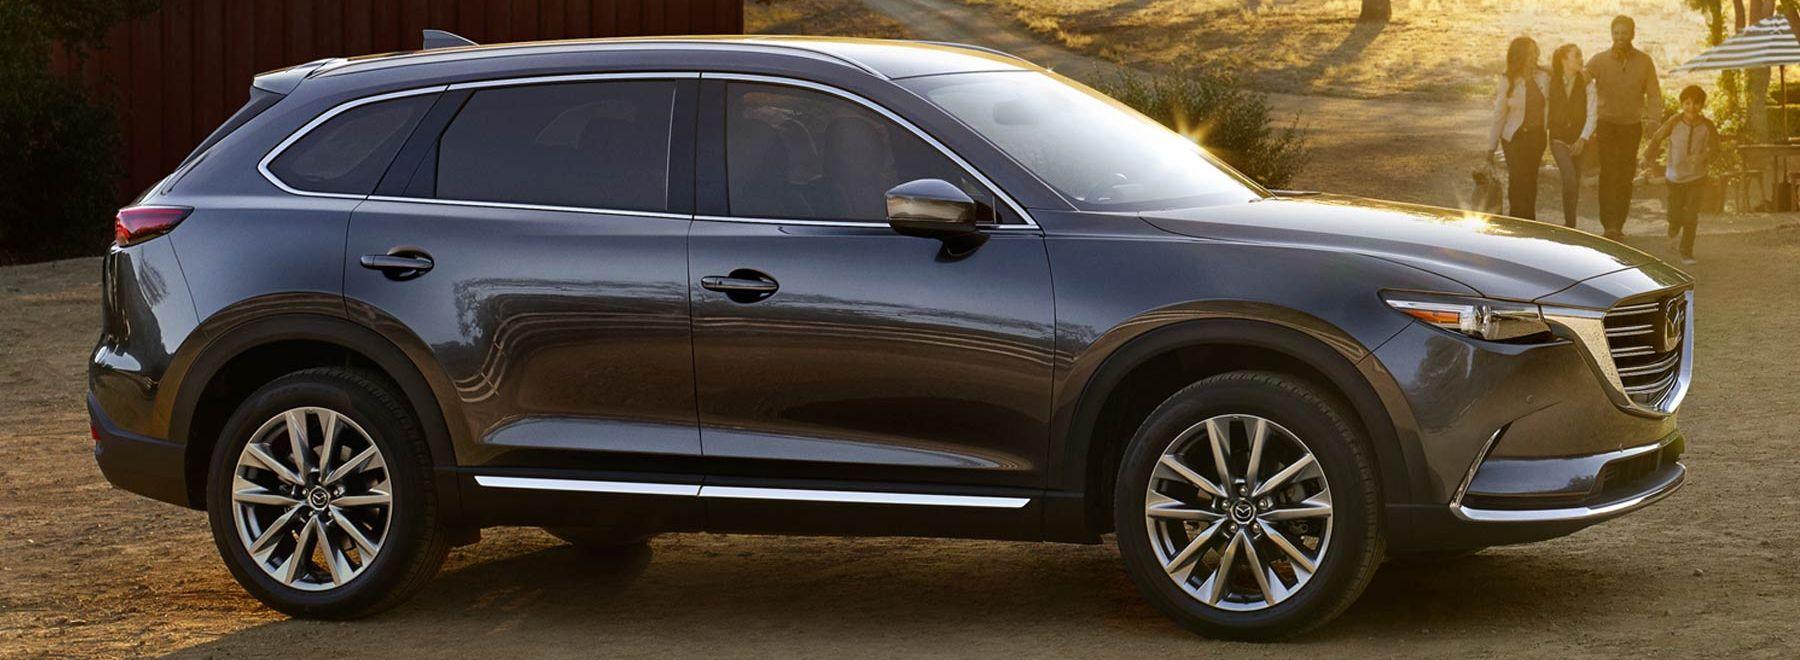 2018 Mazda CX-9 Financing near Sacramento, CA - Mazda of Elk Grove